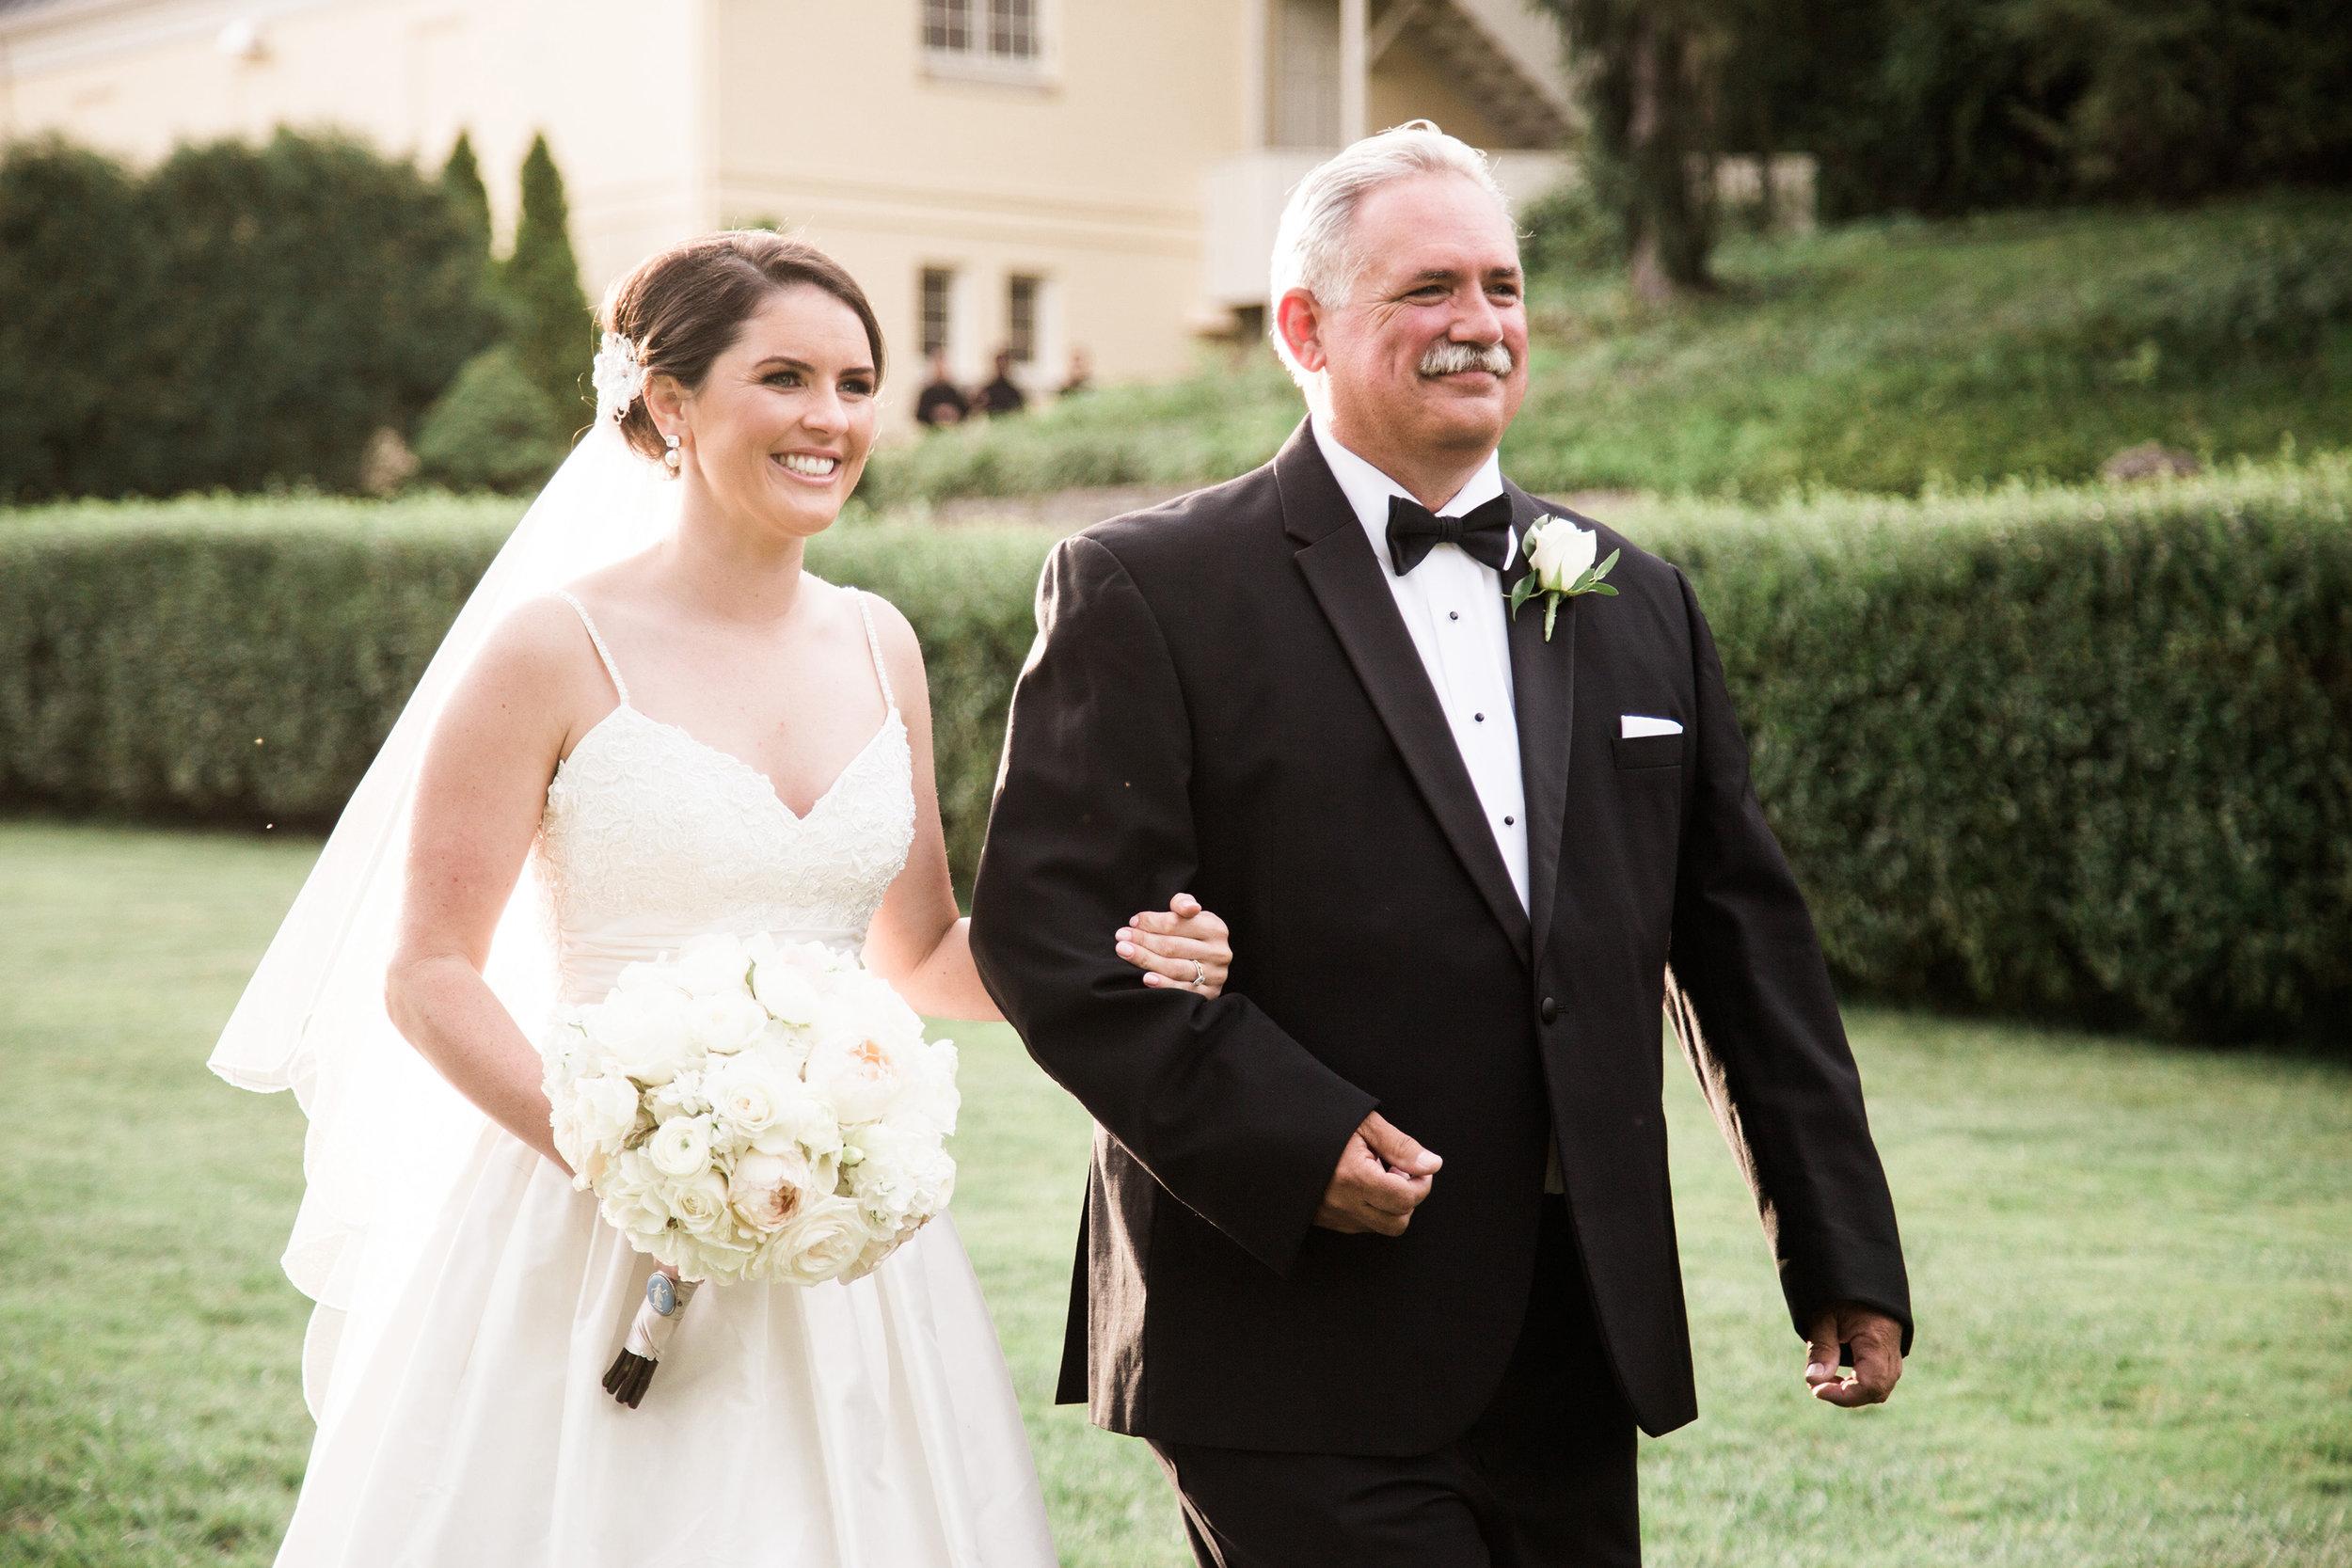 Evergreen-Museum-Balitmore-Maryland-Wedding-Black-Tie-Bride-028.jpg